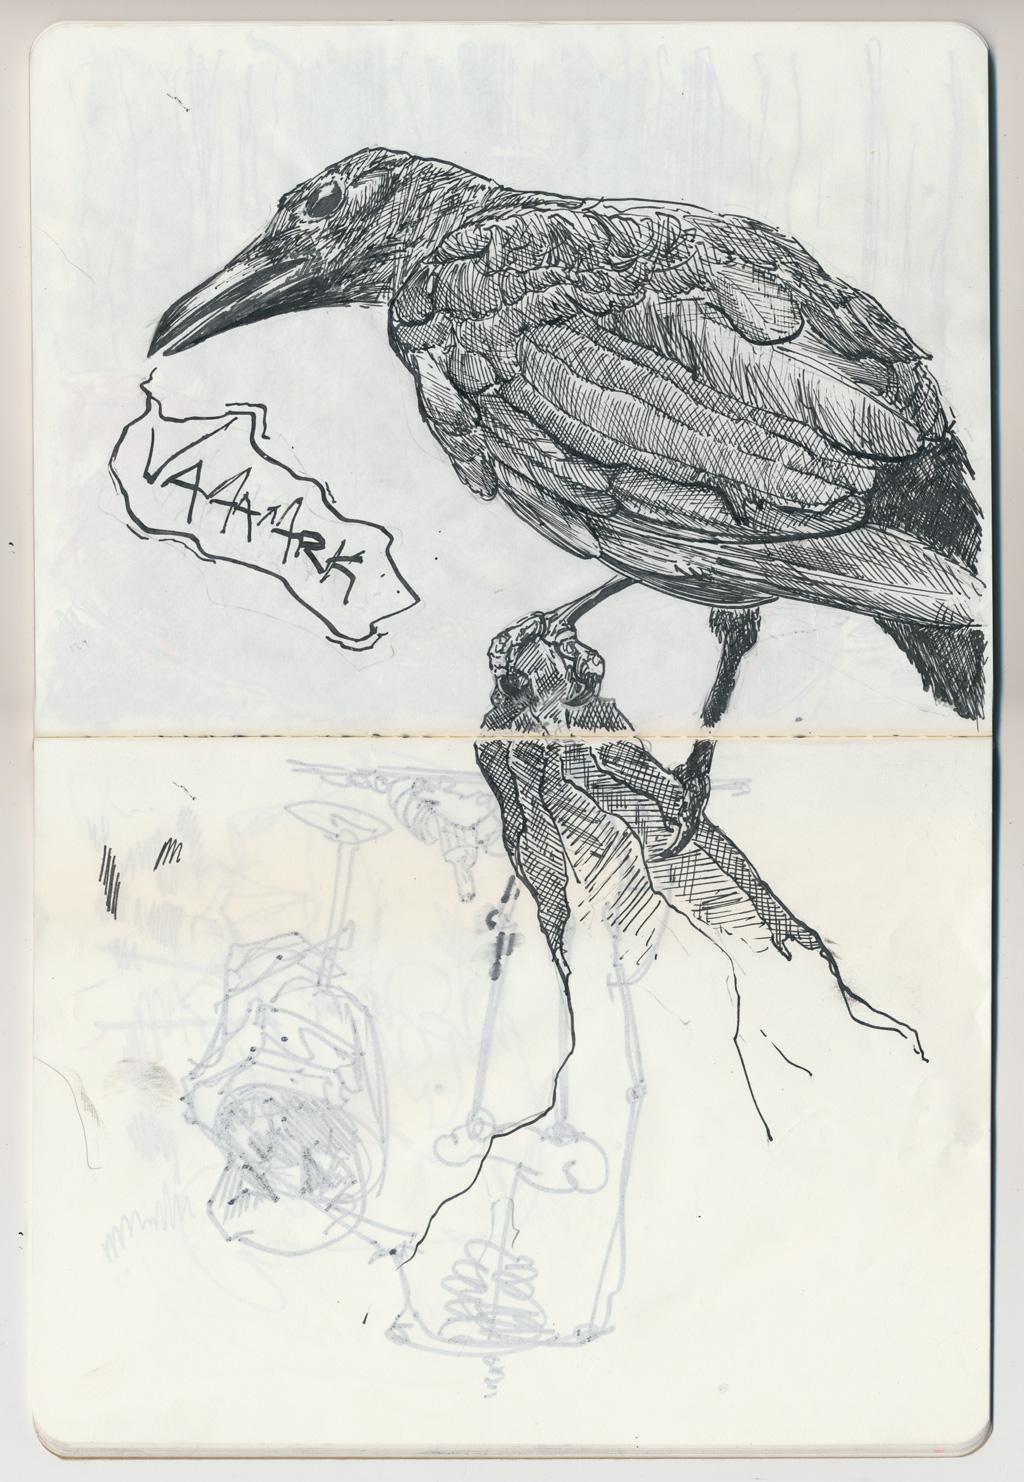 ms003sq-crow.jpg